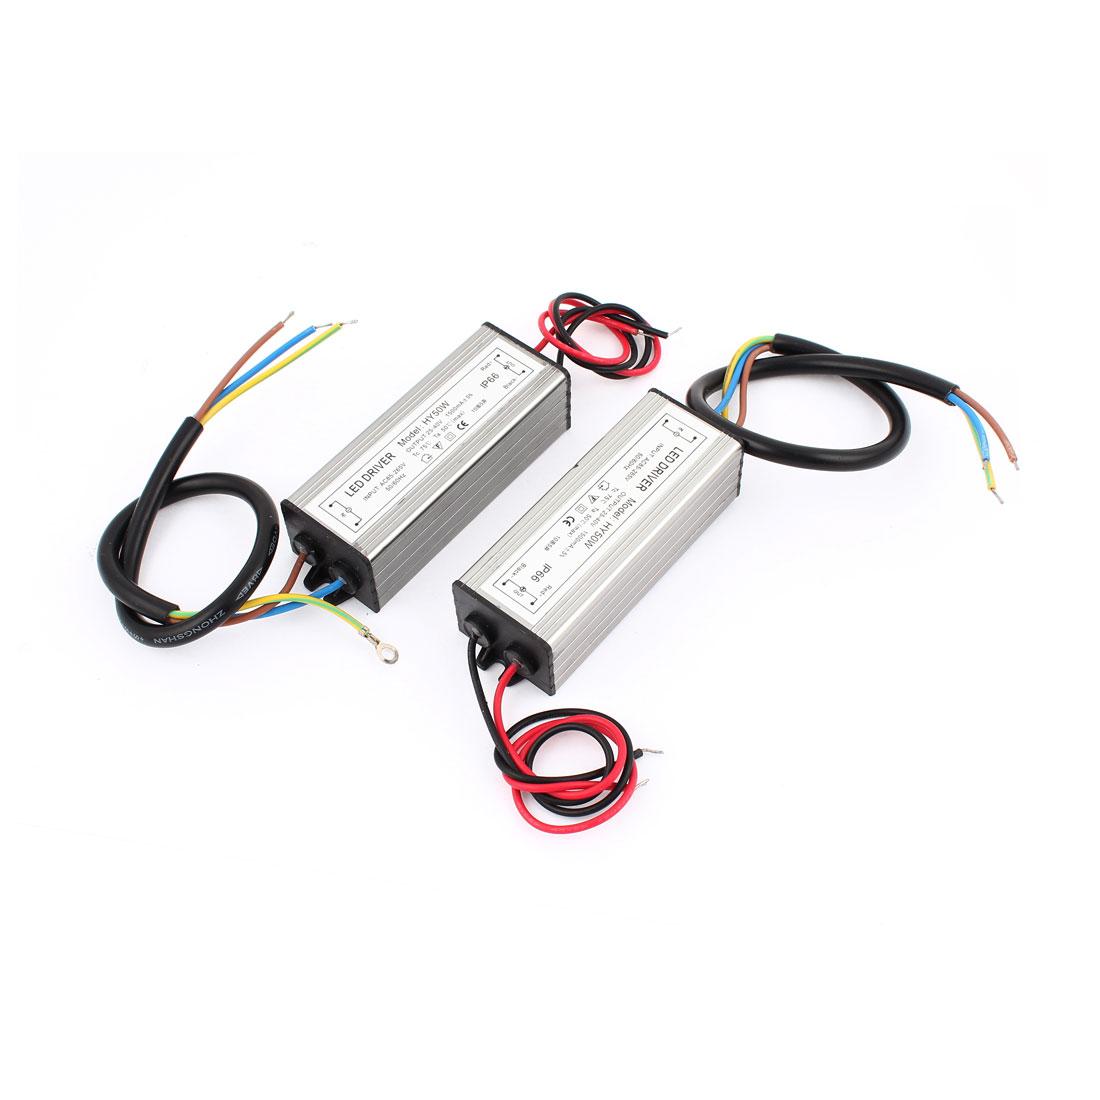 2 Pcs AC 85-265V DC 25-40V 1500mA 50W Waterproof Power Supply for LED Lighting